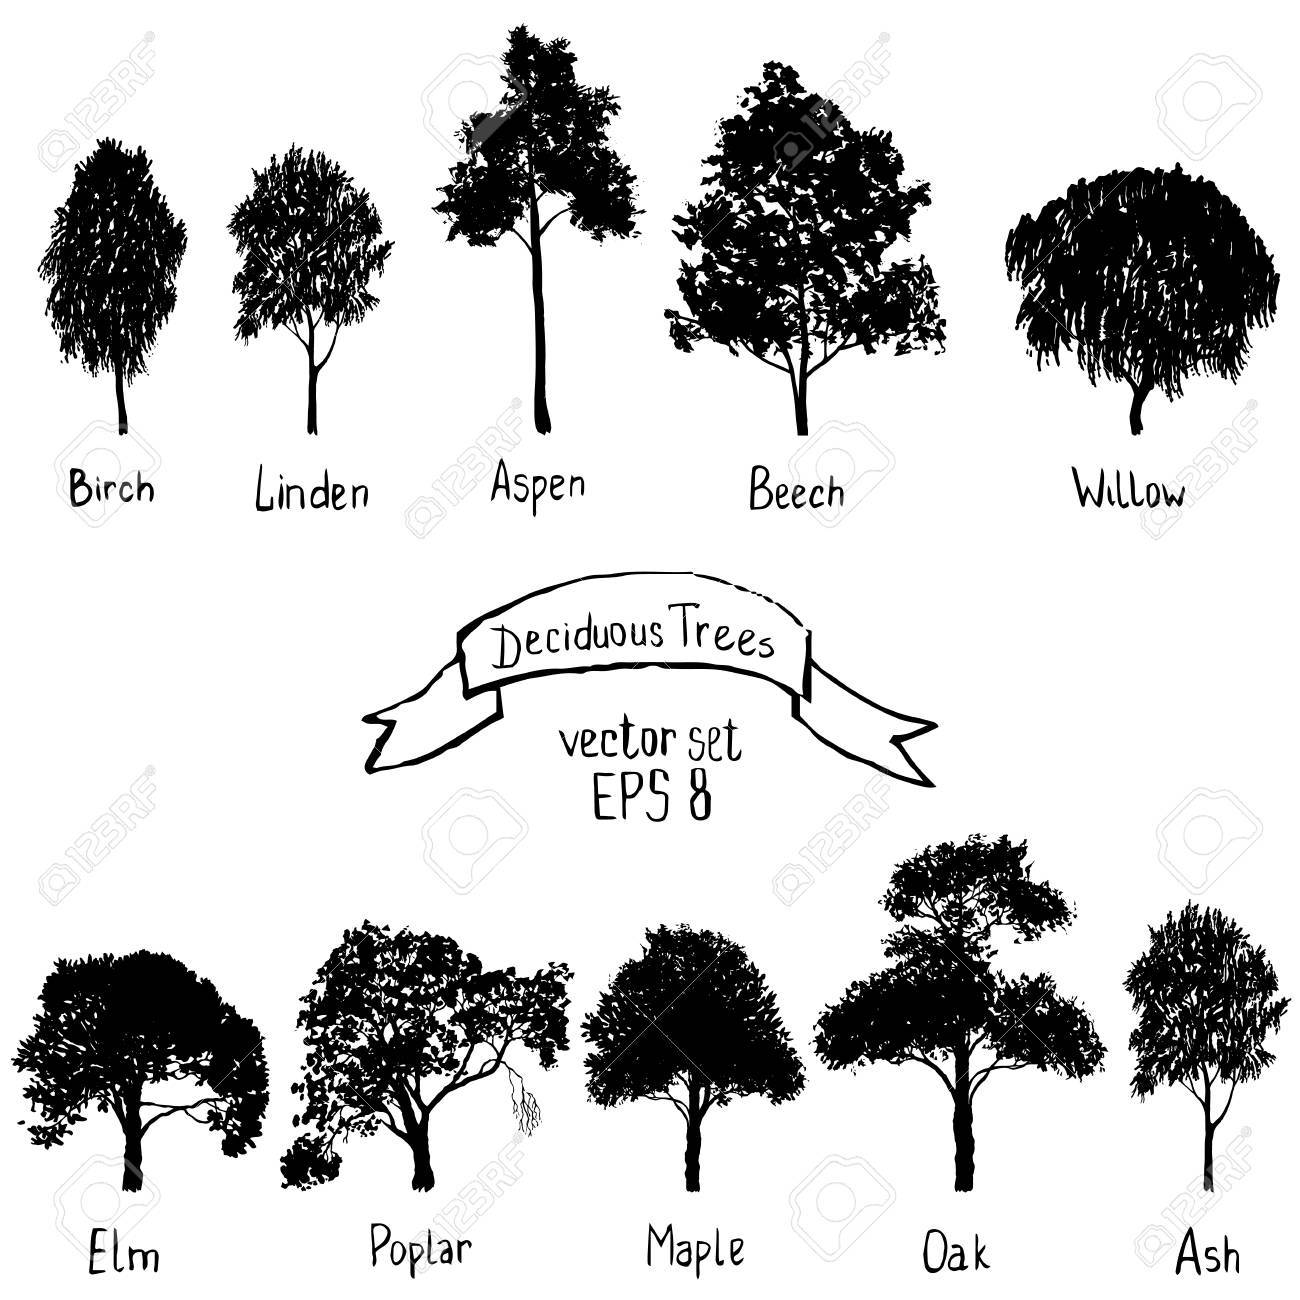 vector set of deciduous trees - 69885650